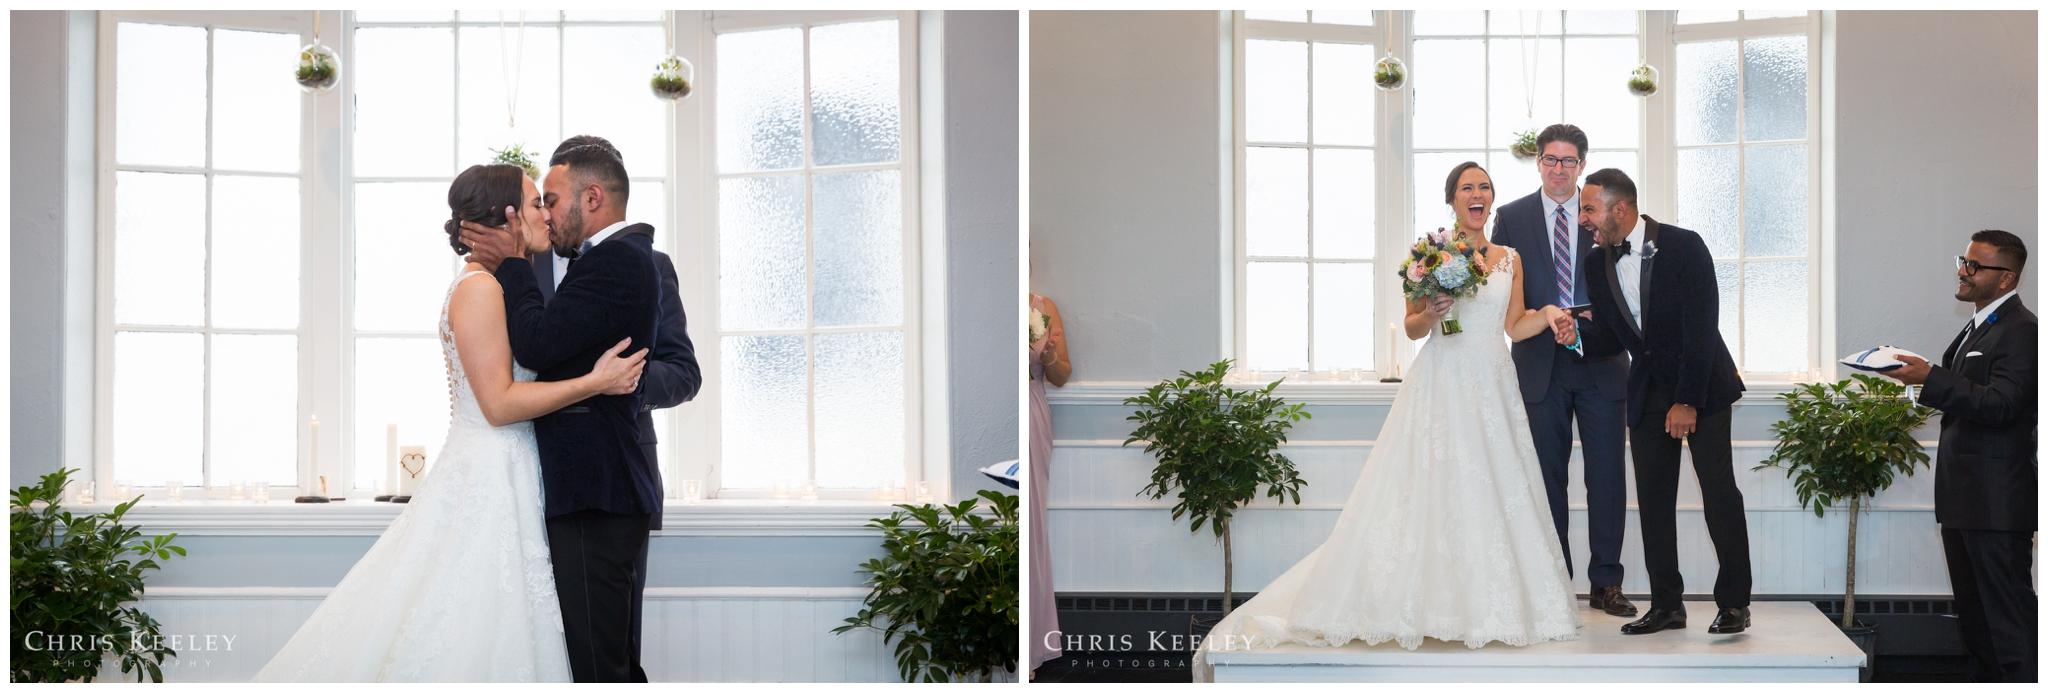 grace-restaurant-portland-maine-wedding-photographer-chris-keeley-43.jpg